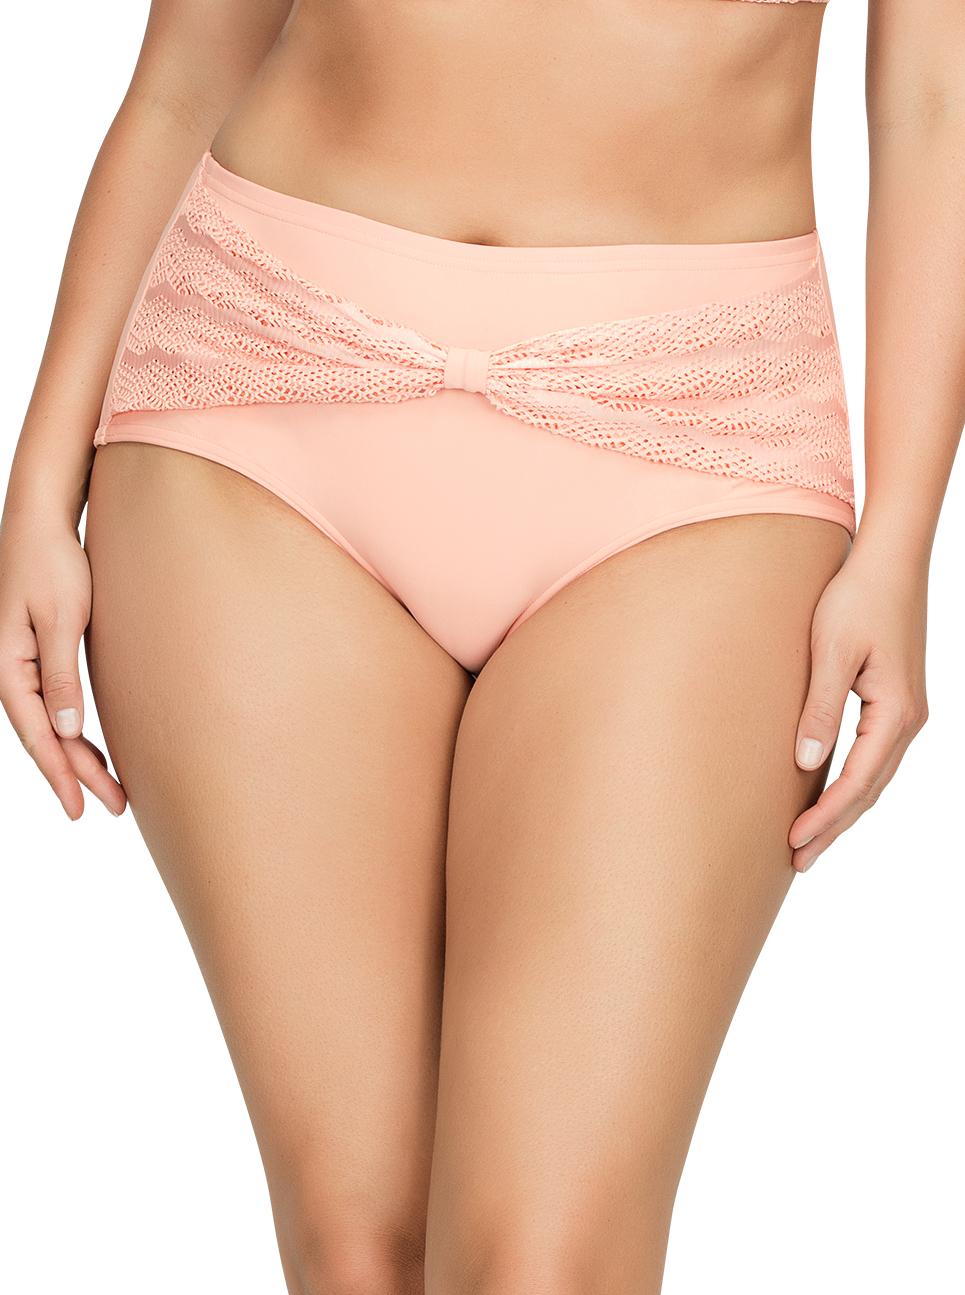 PARFAIT Keira HighWaistBikiniBottomS8075 Peach Front1 - Keira High-Waist Bikini Bottom Peach S8075